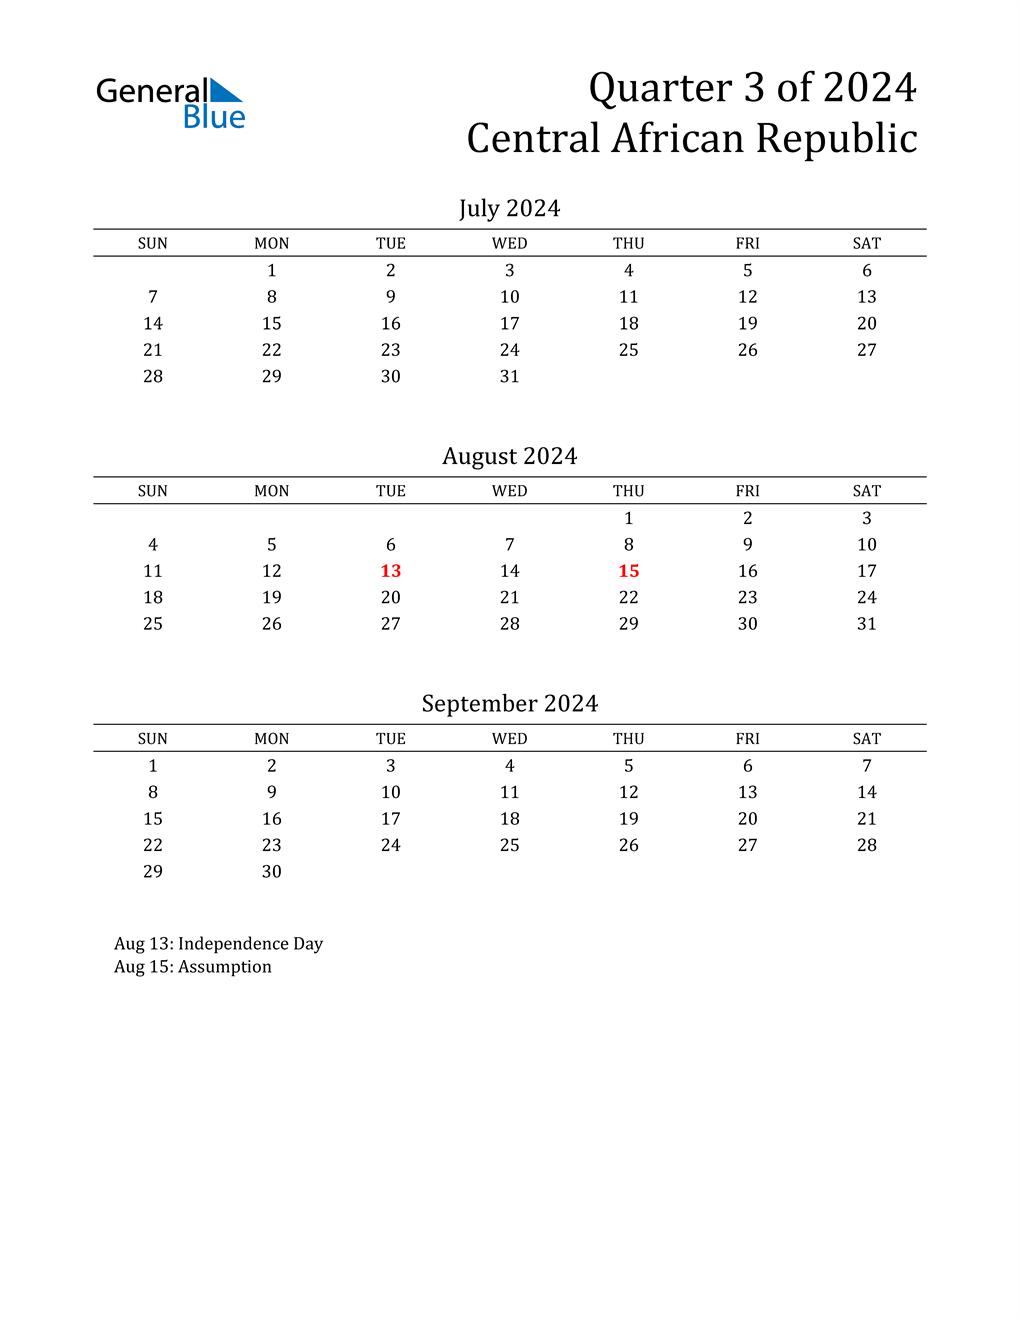 2024 Central African Republic Quarterly Calendar